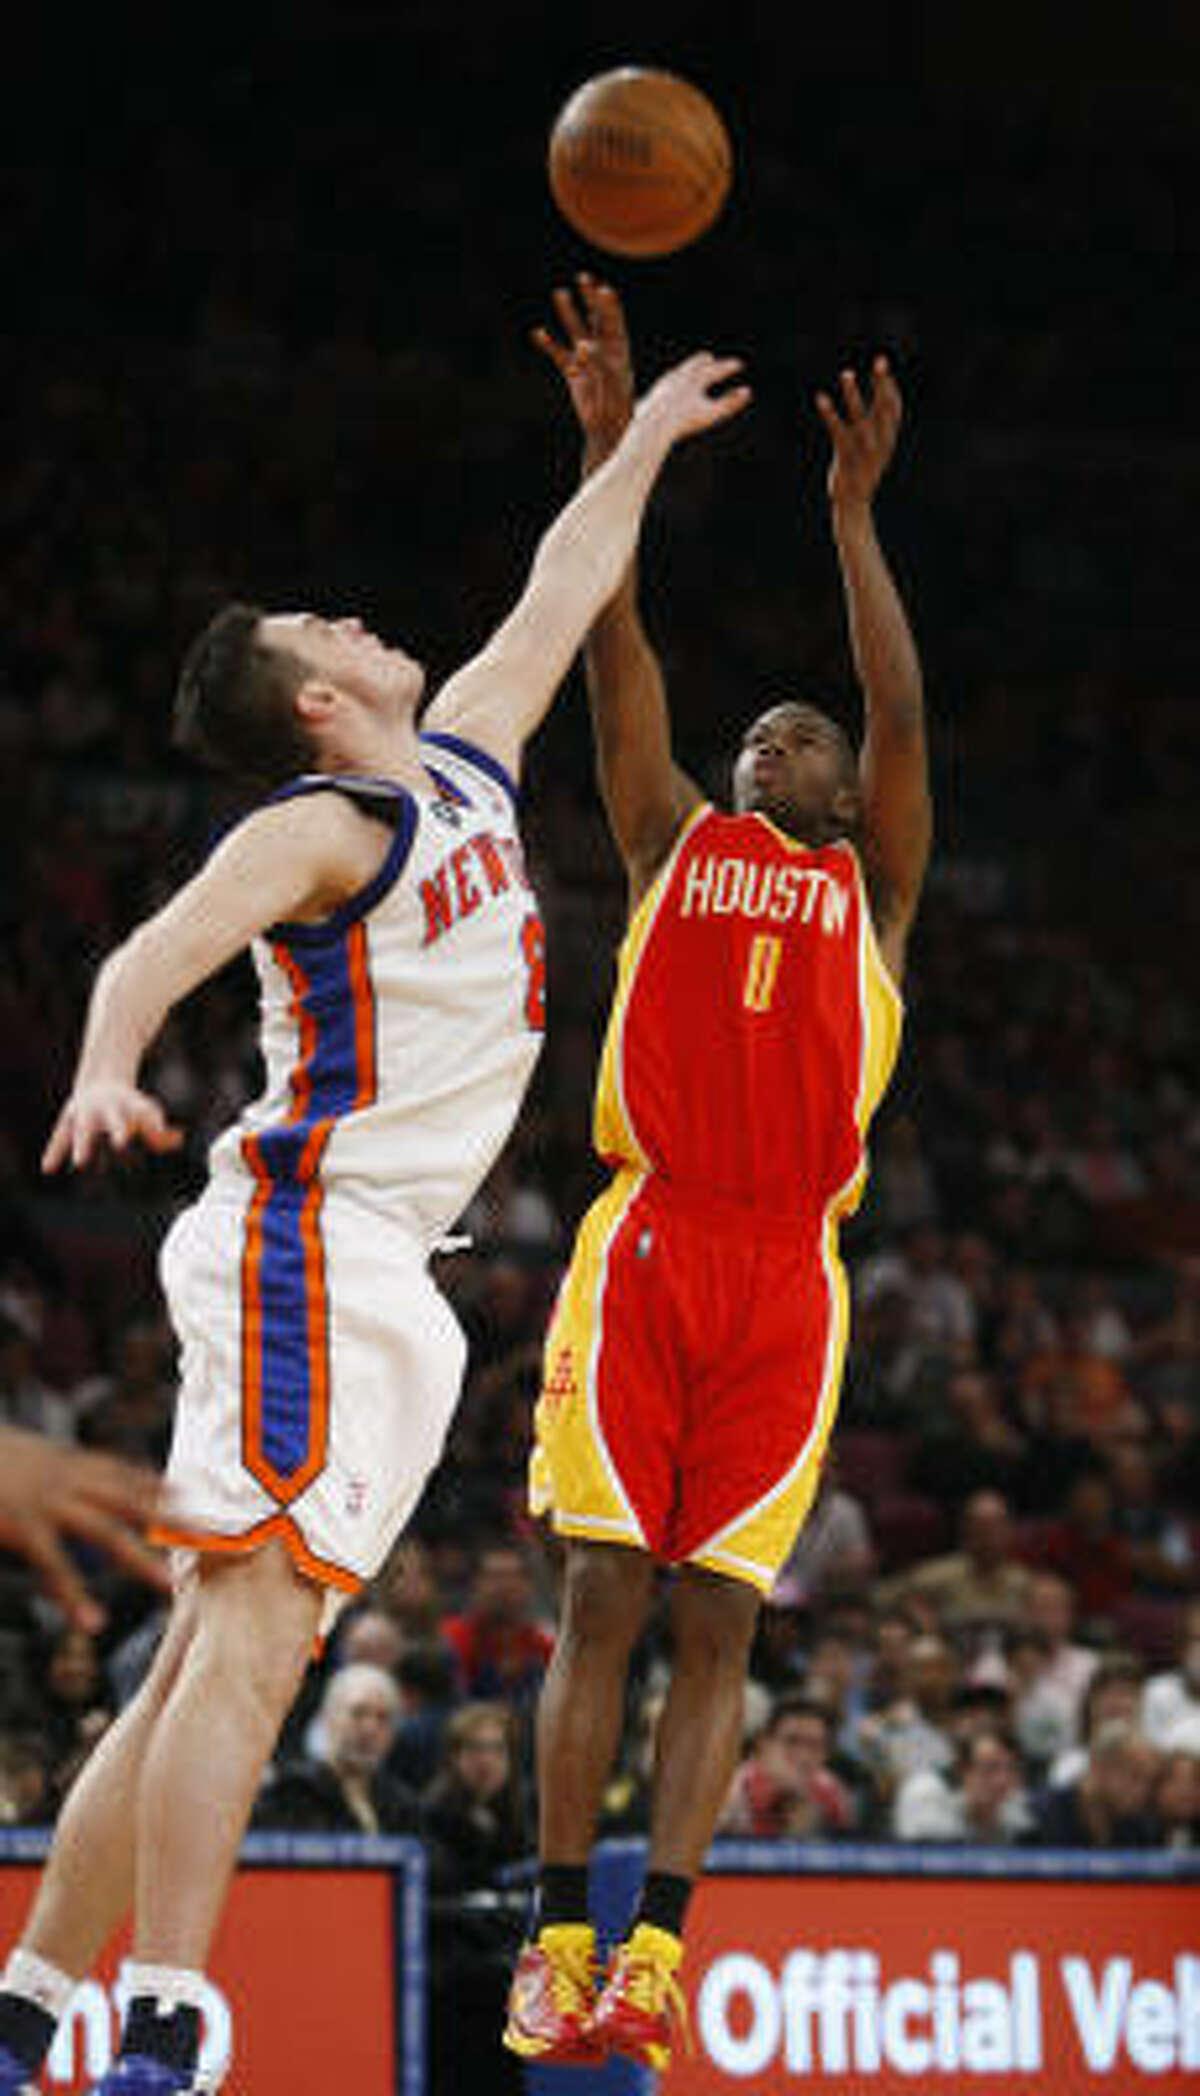 Rockets guard Aaron Brooks (0) shoots a three pointer over New York Knicks forward Danilo Gallinari, left, in the fourth quarter. Brooks scored 16 points in the Rockets 116-112 victory over the New York Knicks.